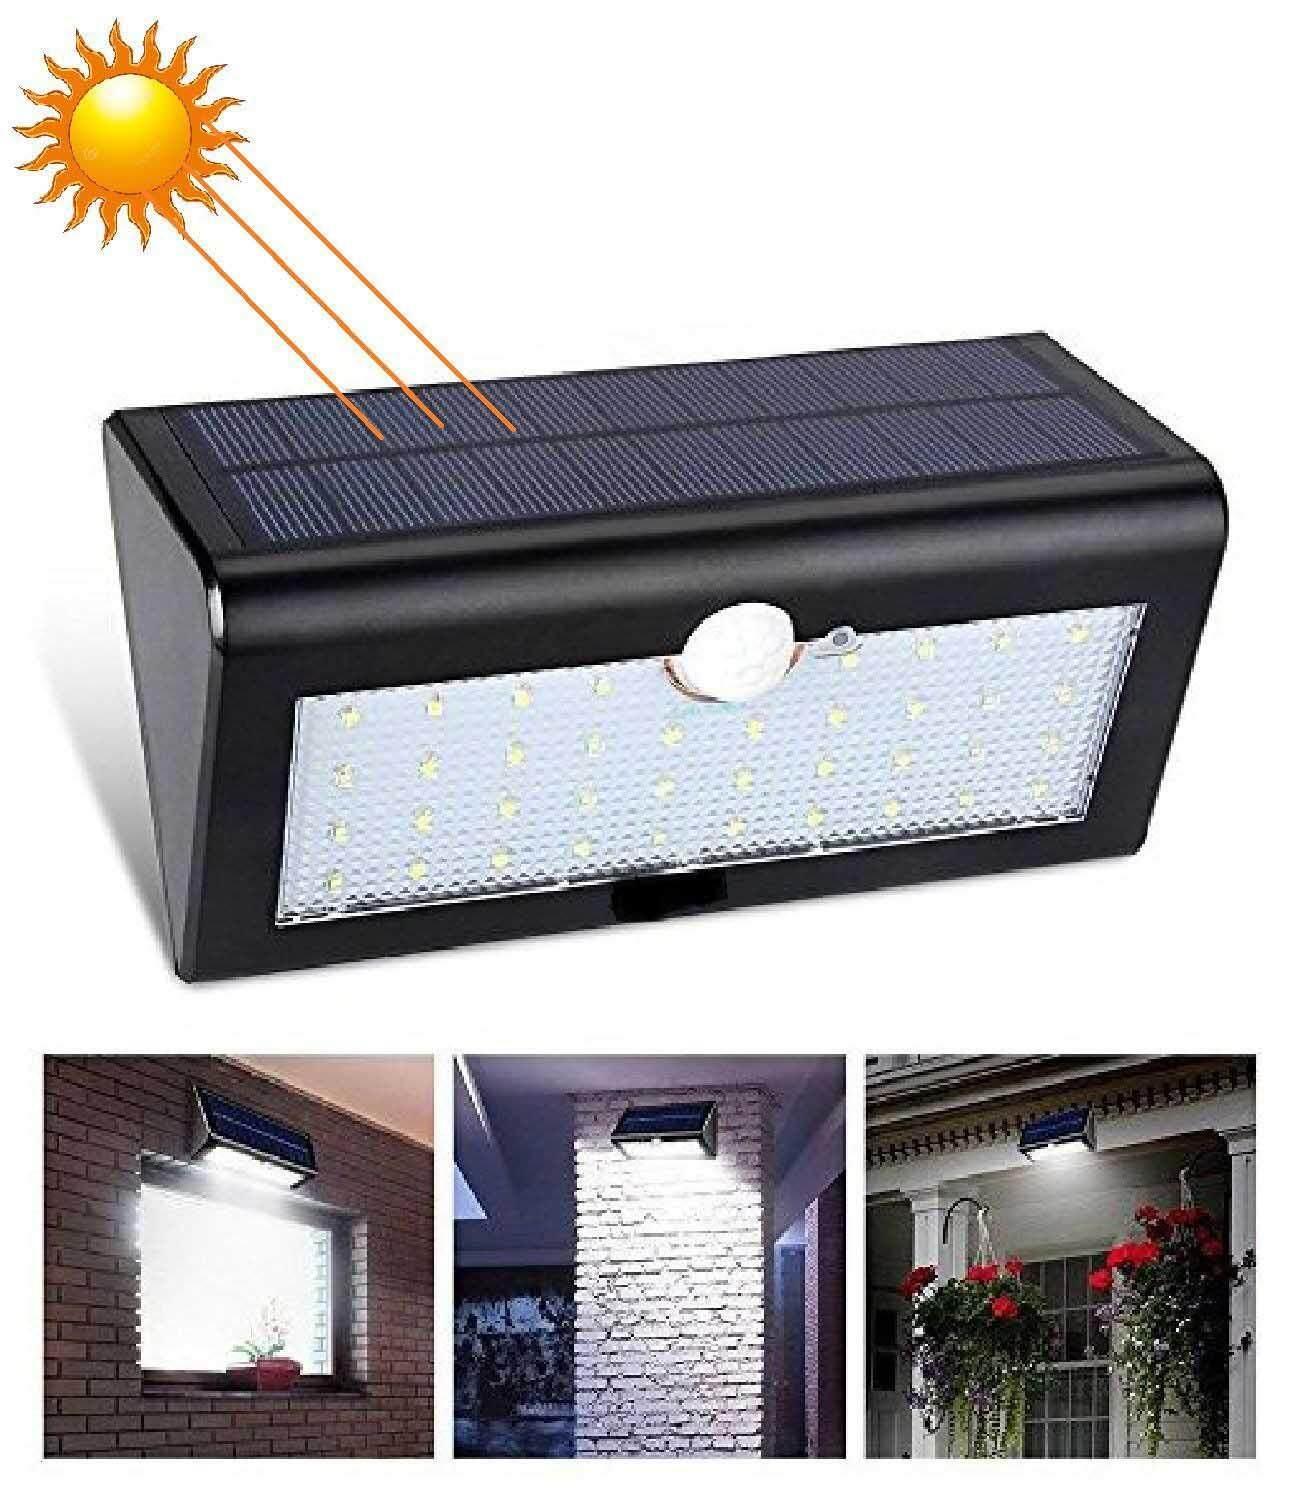 Bkk Lighting ไฟติดผนังโซล่าเซลล์พลังงานแสงอาทิตย์ 30 Led 1 ชิ้น Solar Powered Motion Sensor Wall Light 3 Mode .